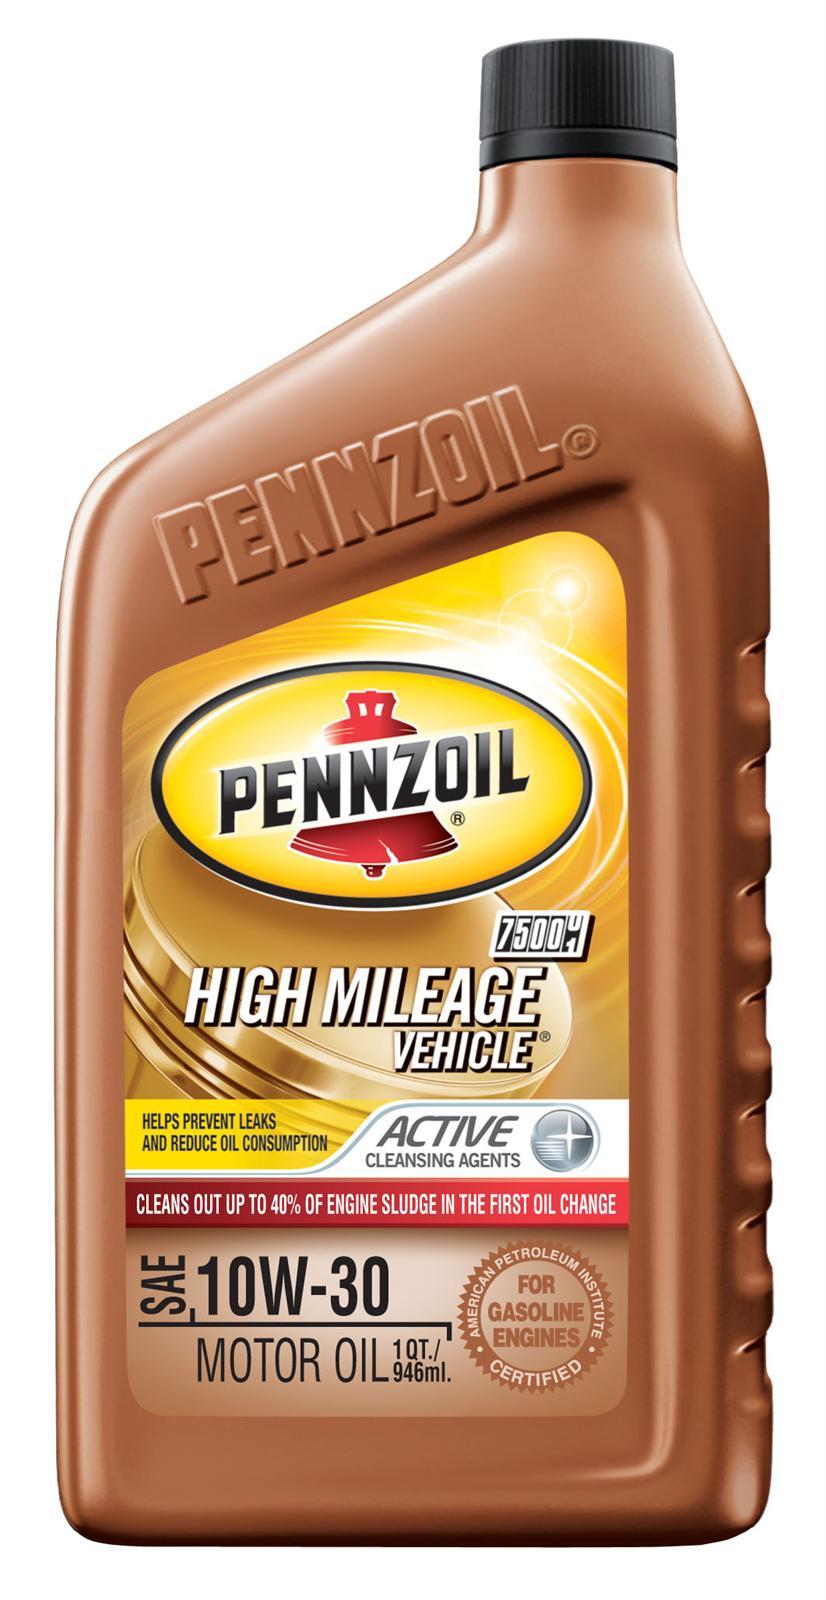 Pennzoil motor oil pennzoil high mileage 10w30 1 quart for What motor oil to use for high mileage engine